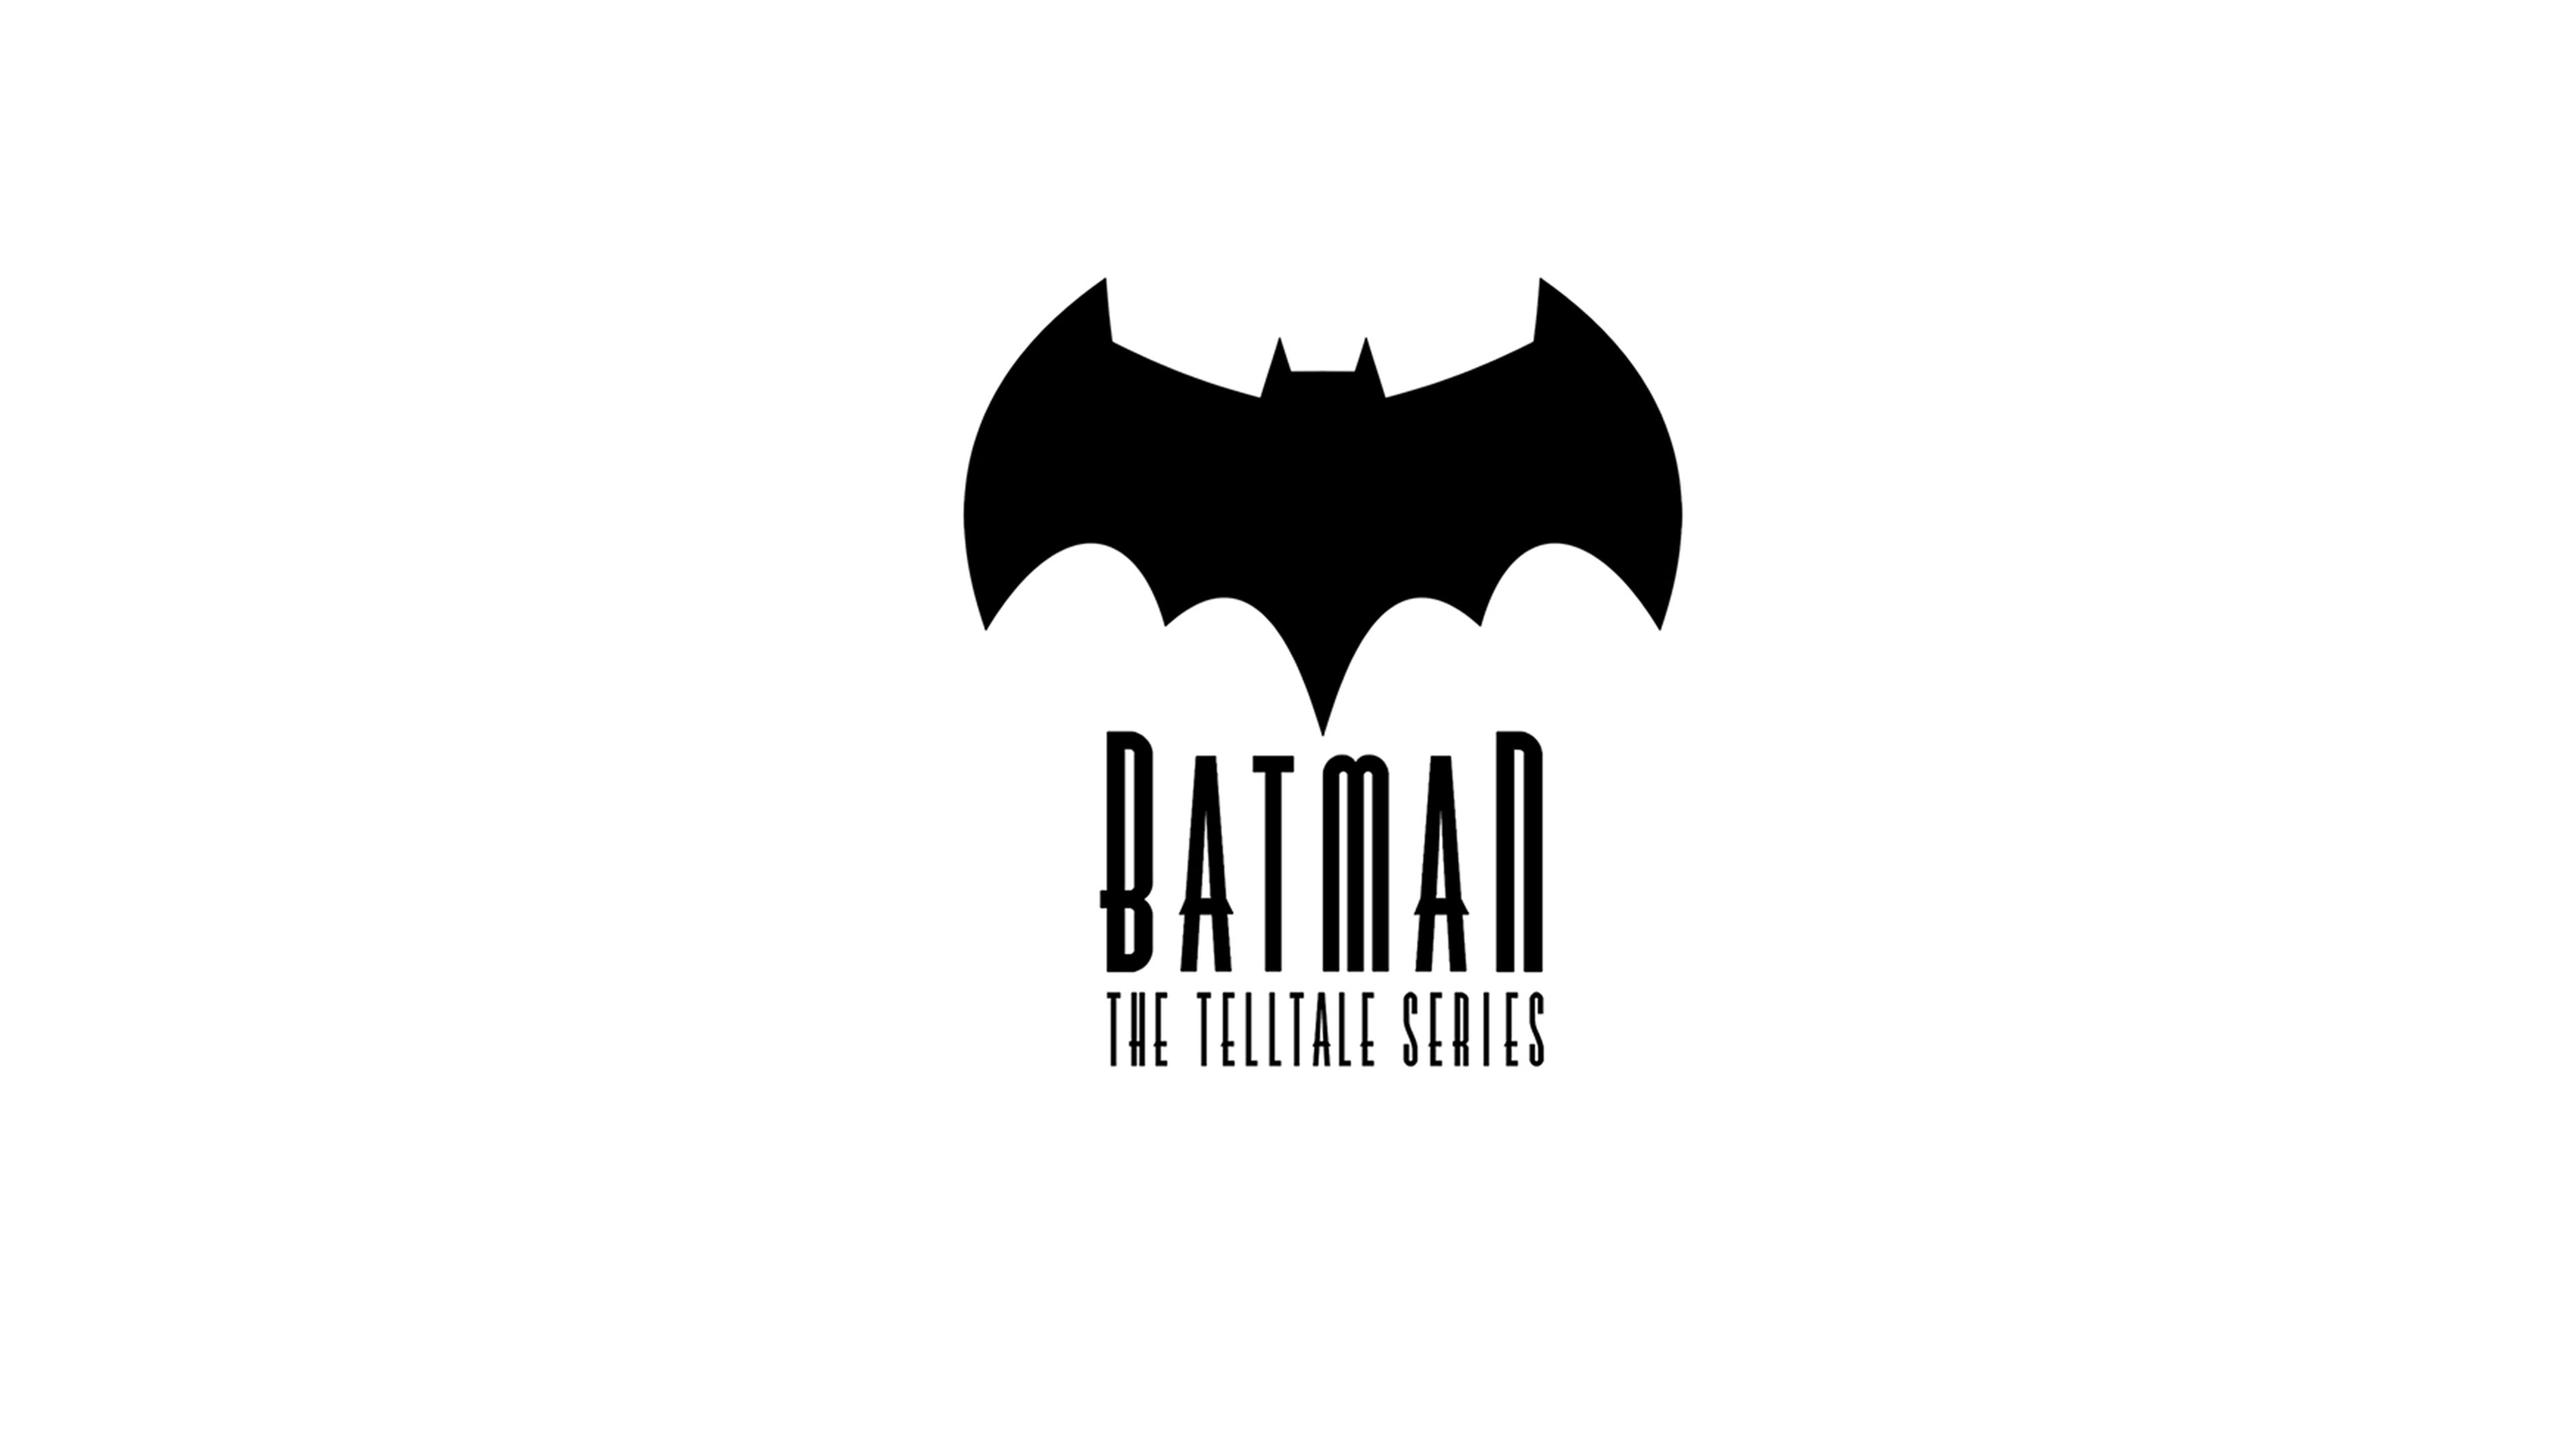 batman the telltale series 1536010142 - Batman The Telltale Series - games wallpapersbatman wallpapers, games wallpapers, batman the telltale series wallpapers